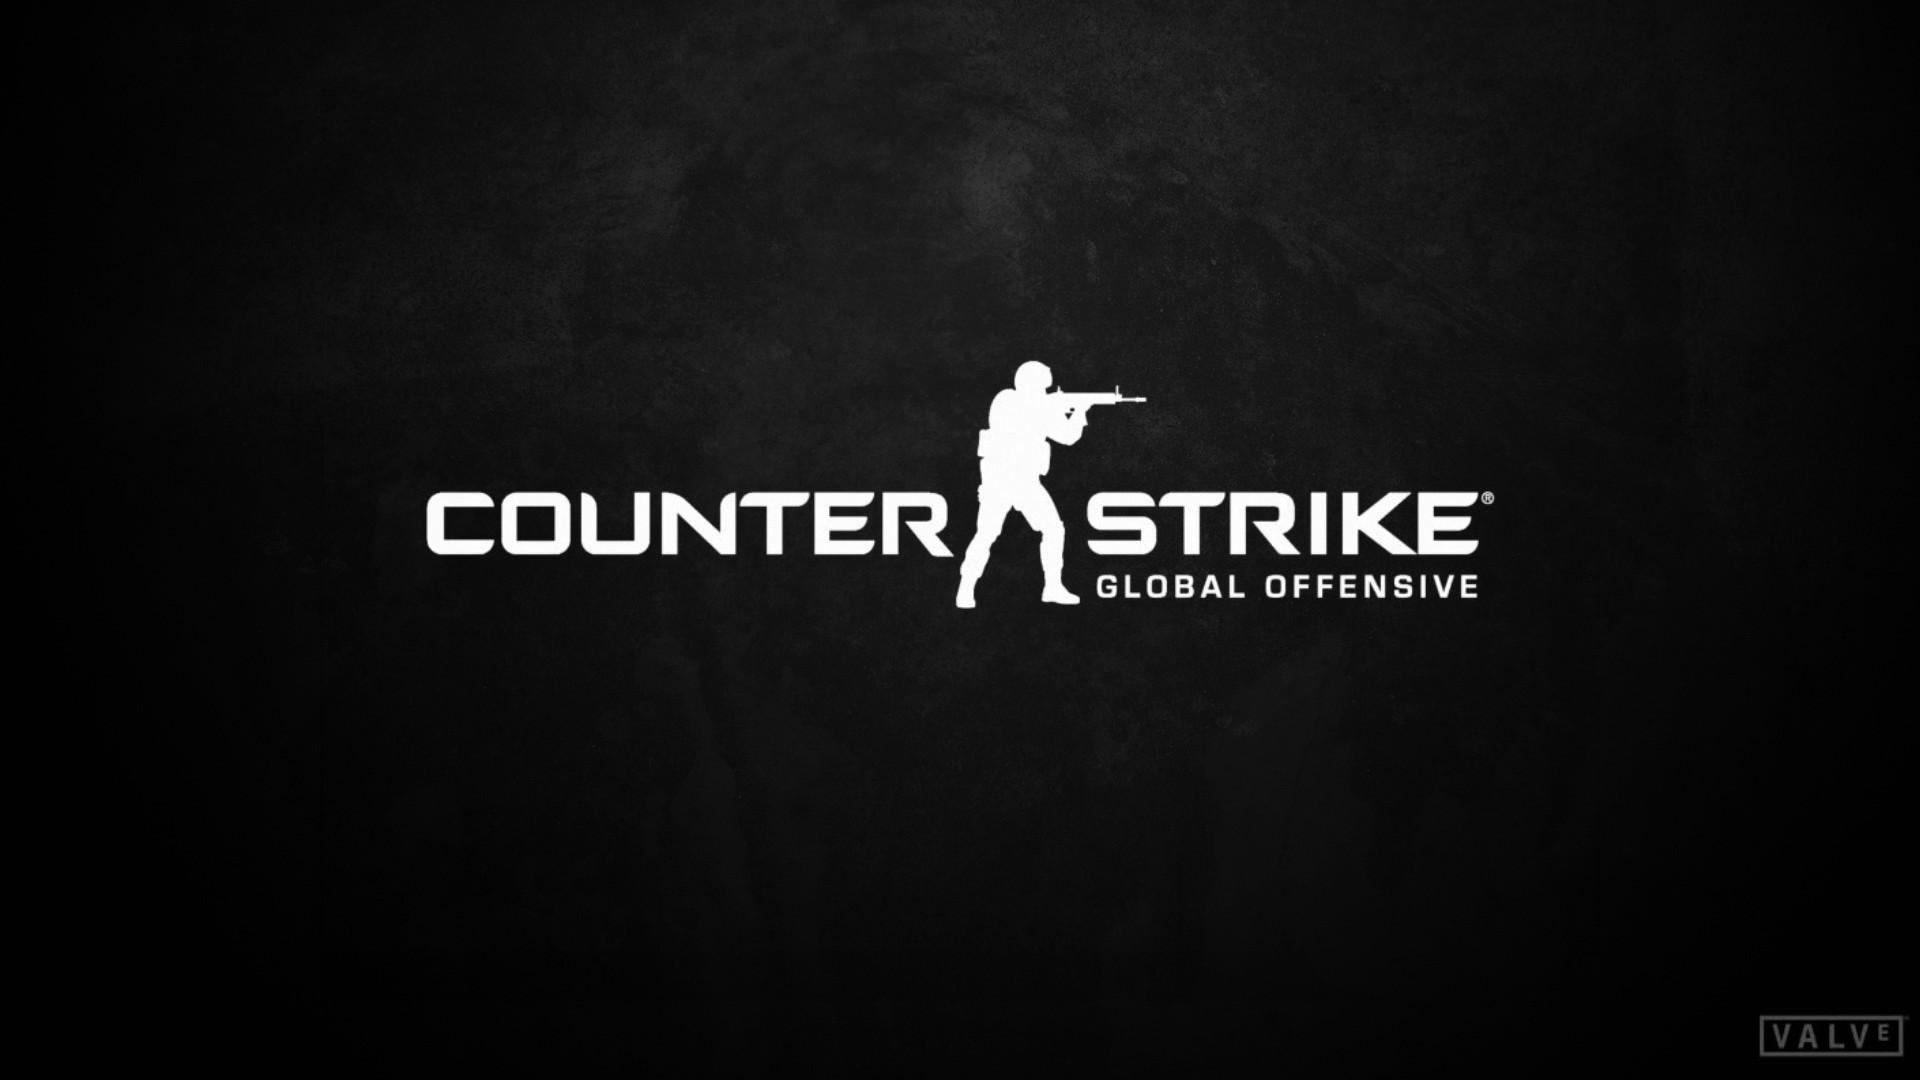 Download Counter Strike Global Offensive Wallpaper HD | Надо  купить | Pinterest